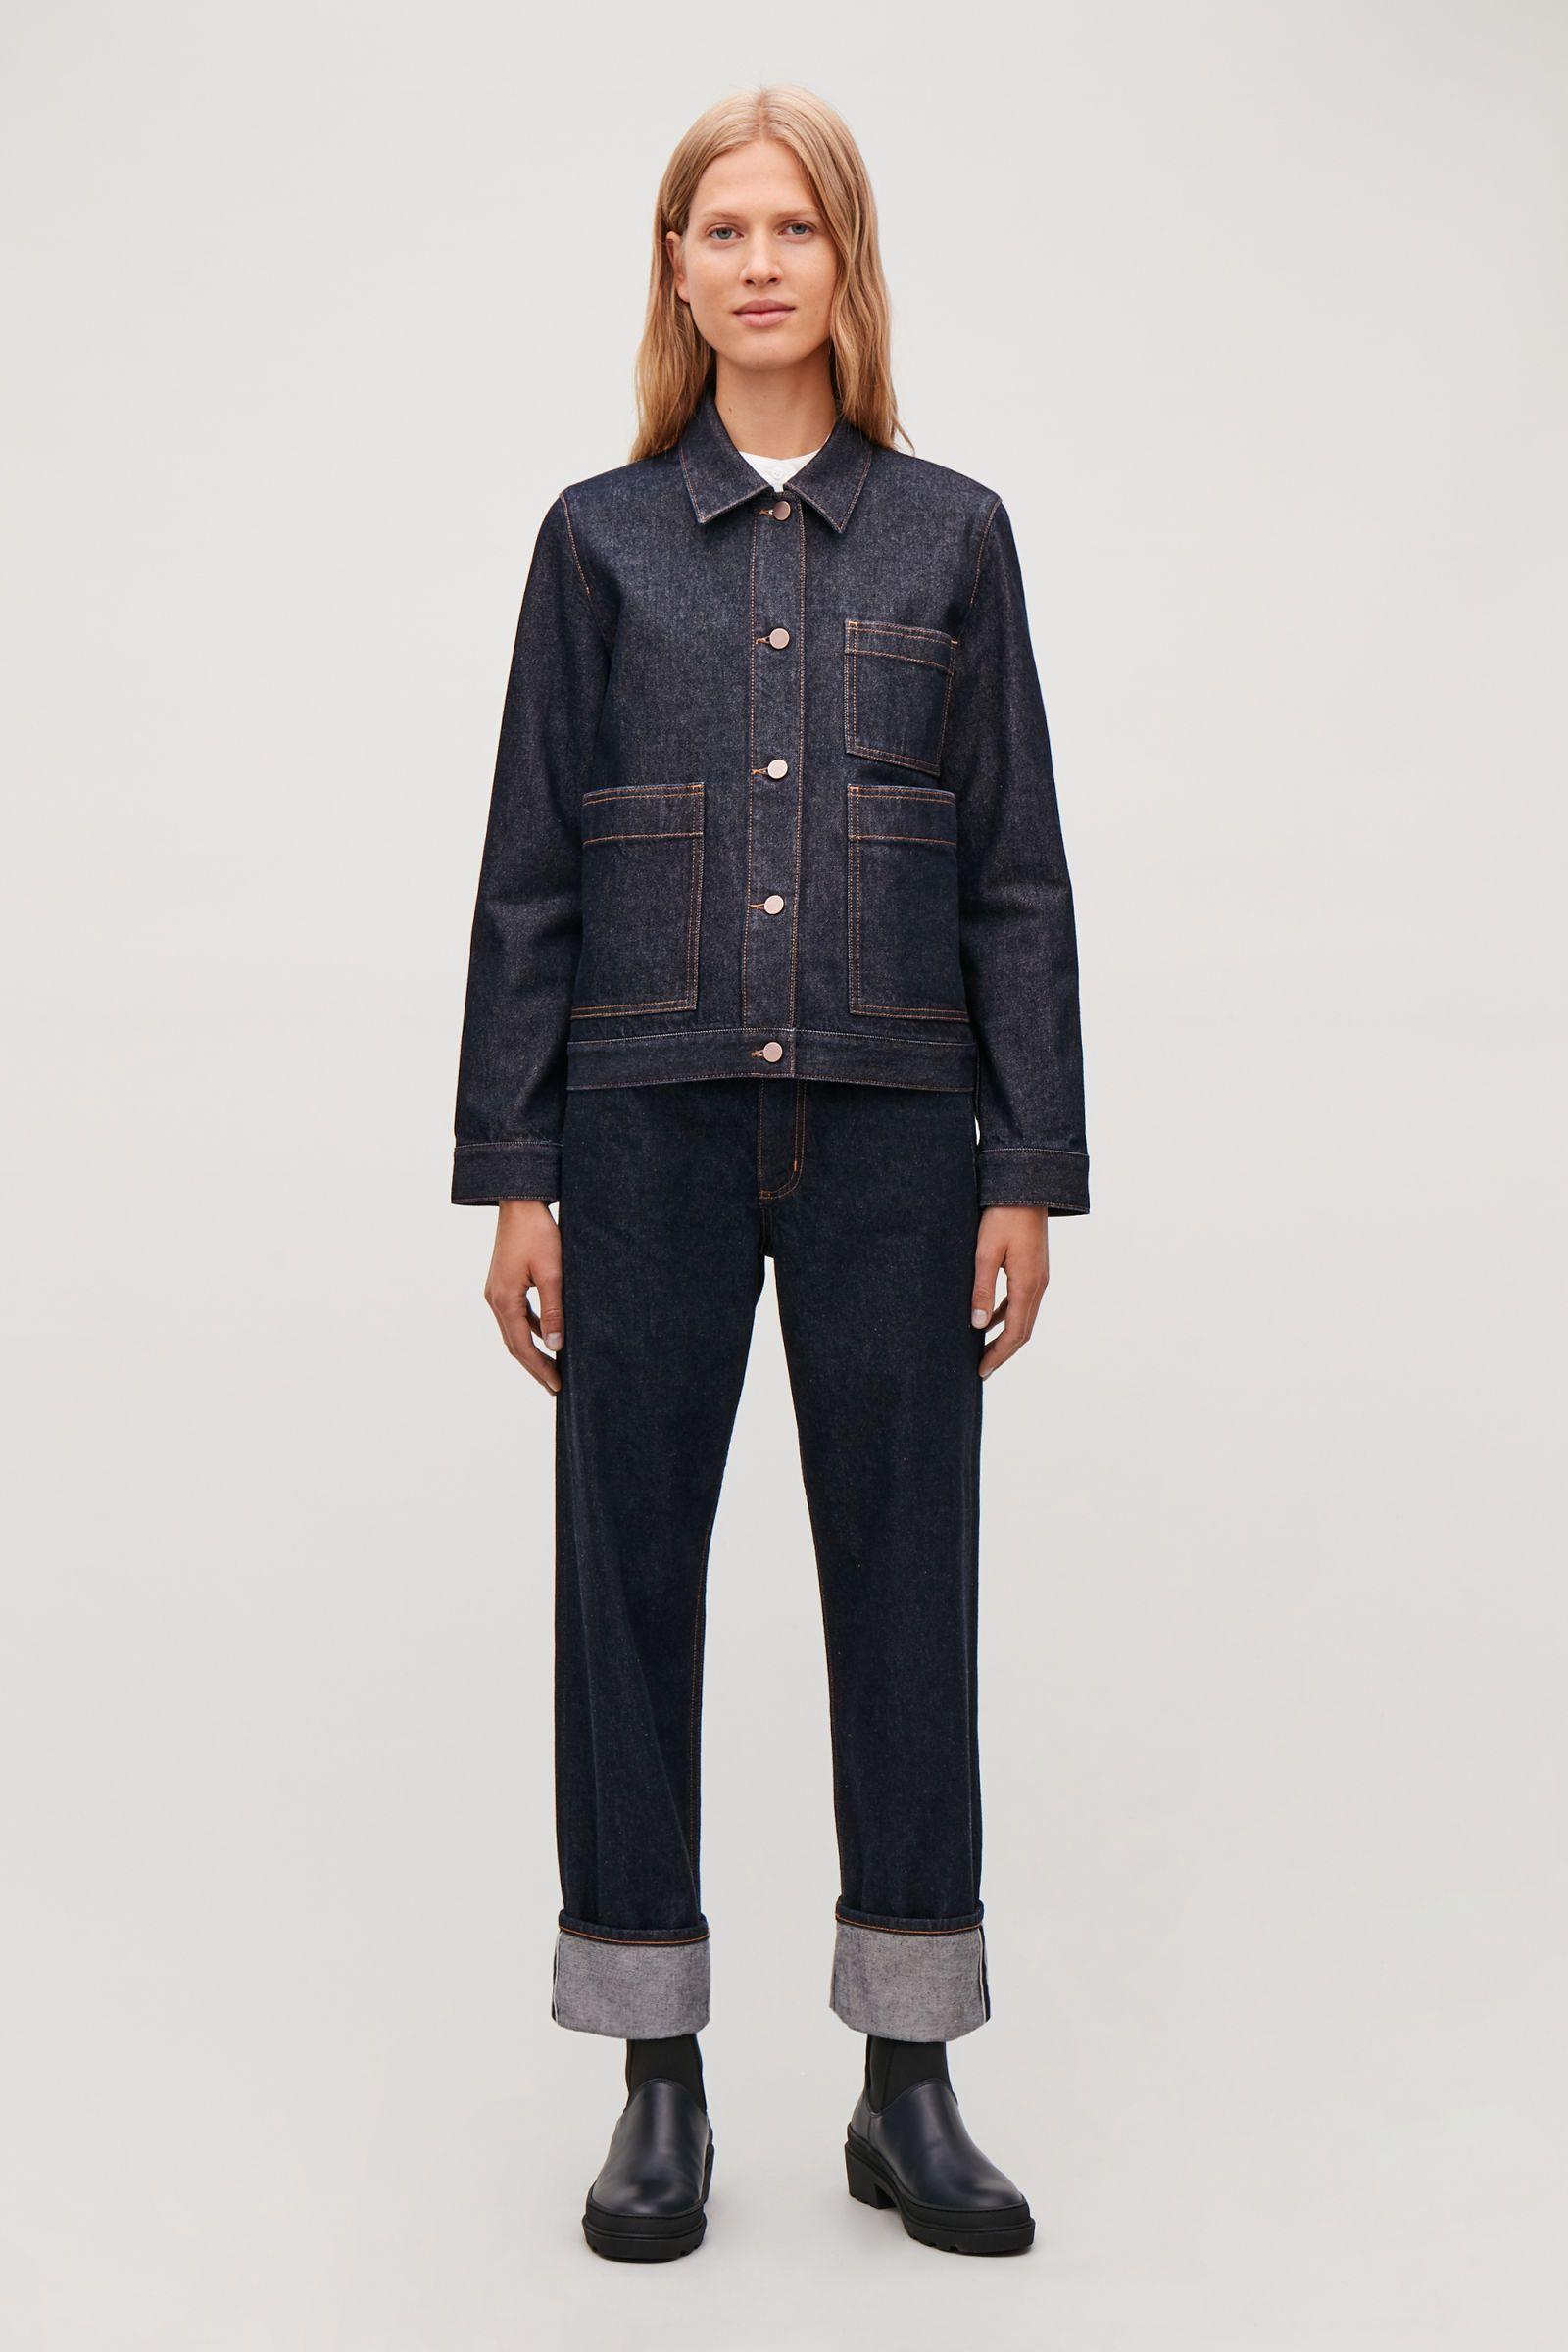 Pin By Alina Parfenov On Denim Denim Jacket Denim Coats Jackets Women